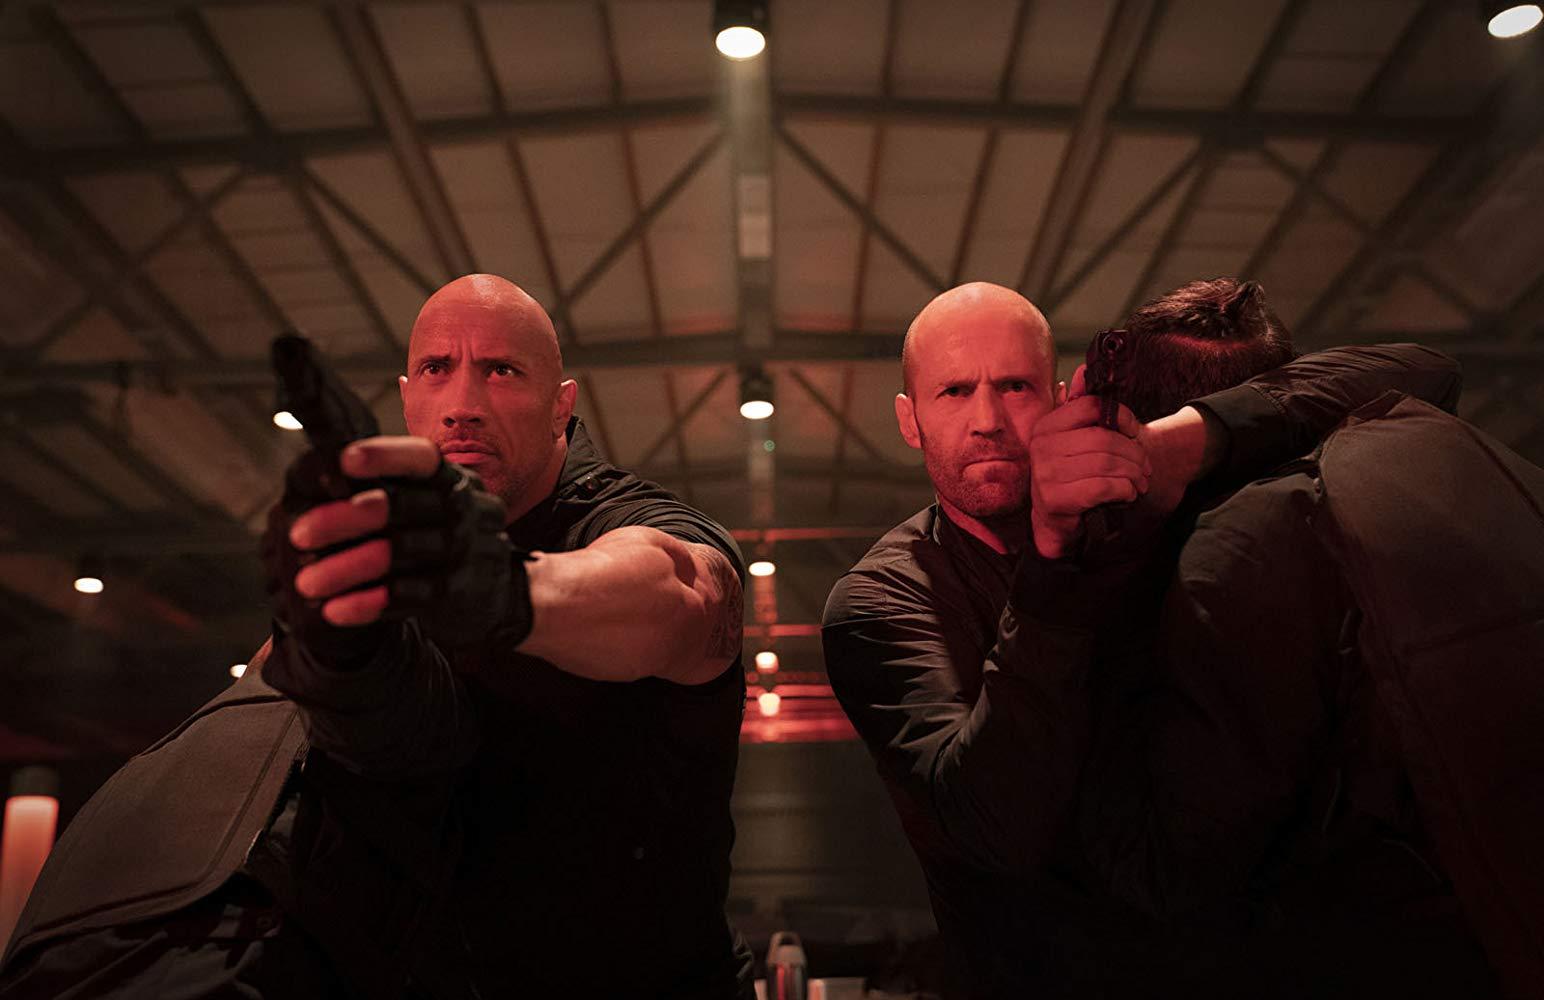 Jason Statham y Dwayne Johnson en Hobbs y Shaw (Crítica de la película Fast & Furious)